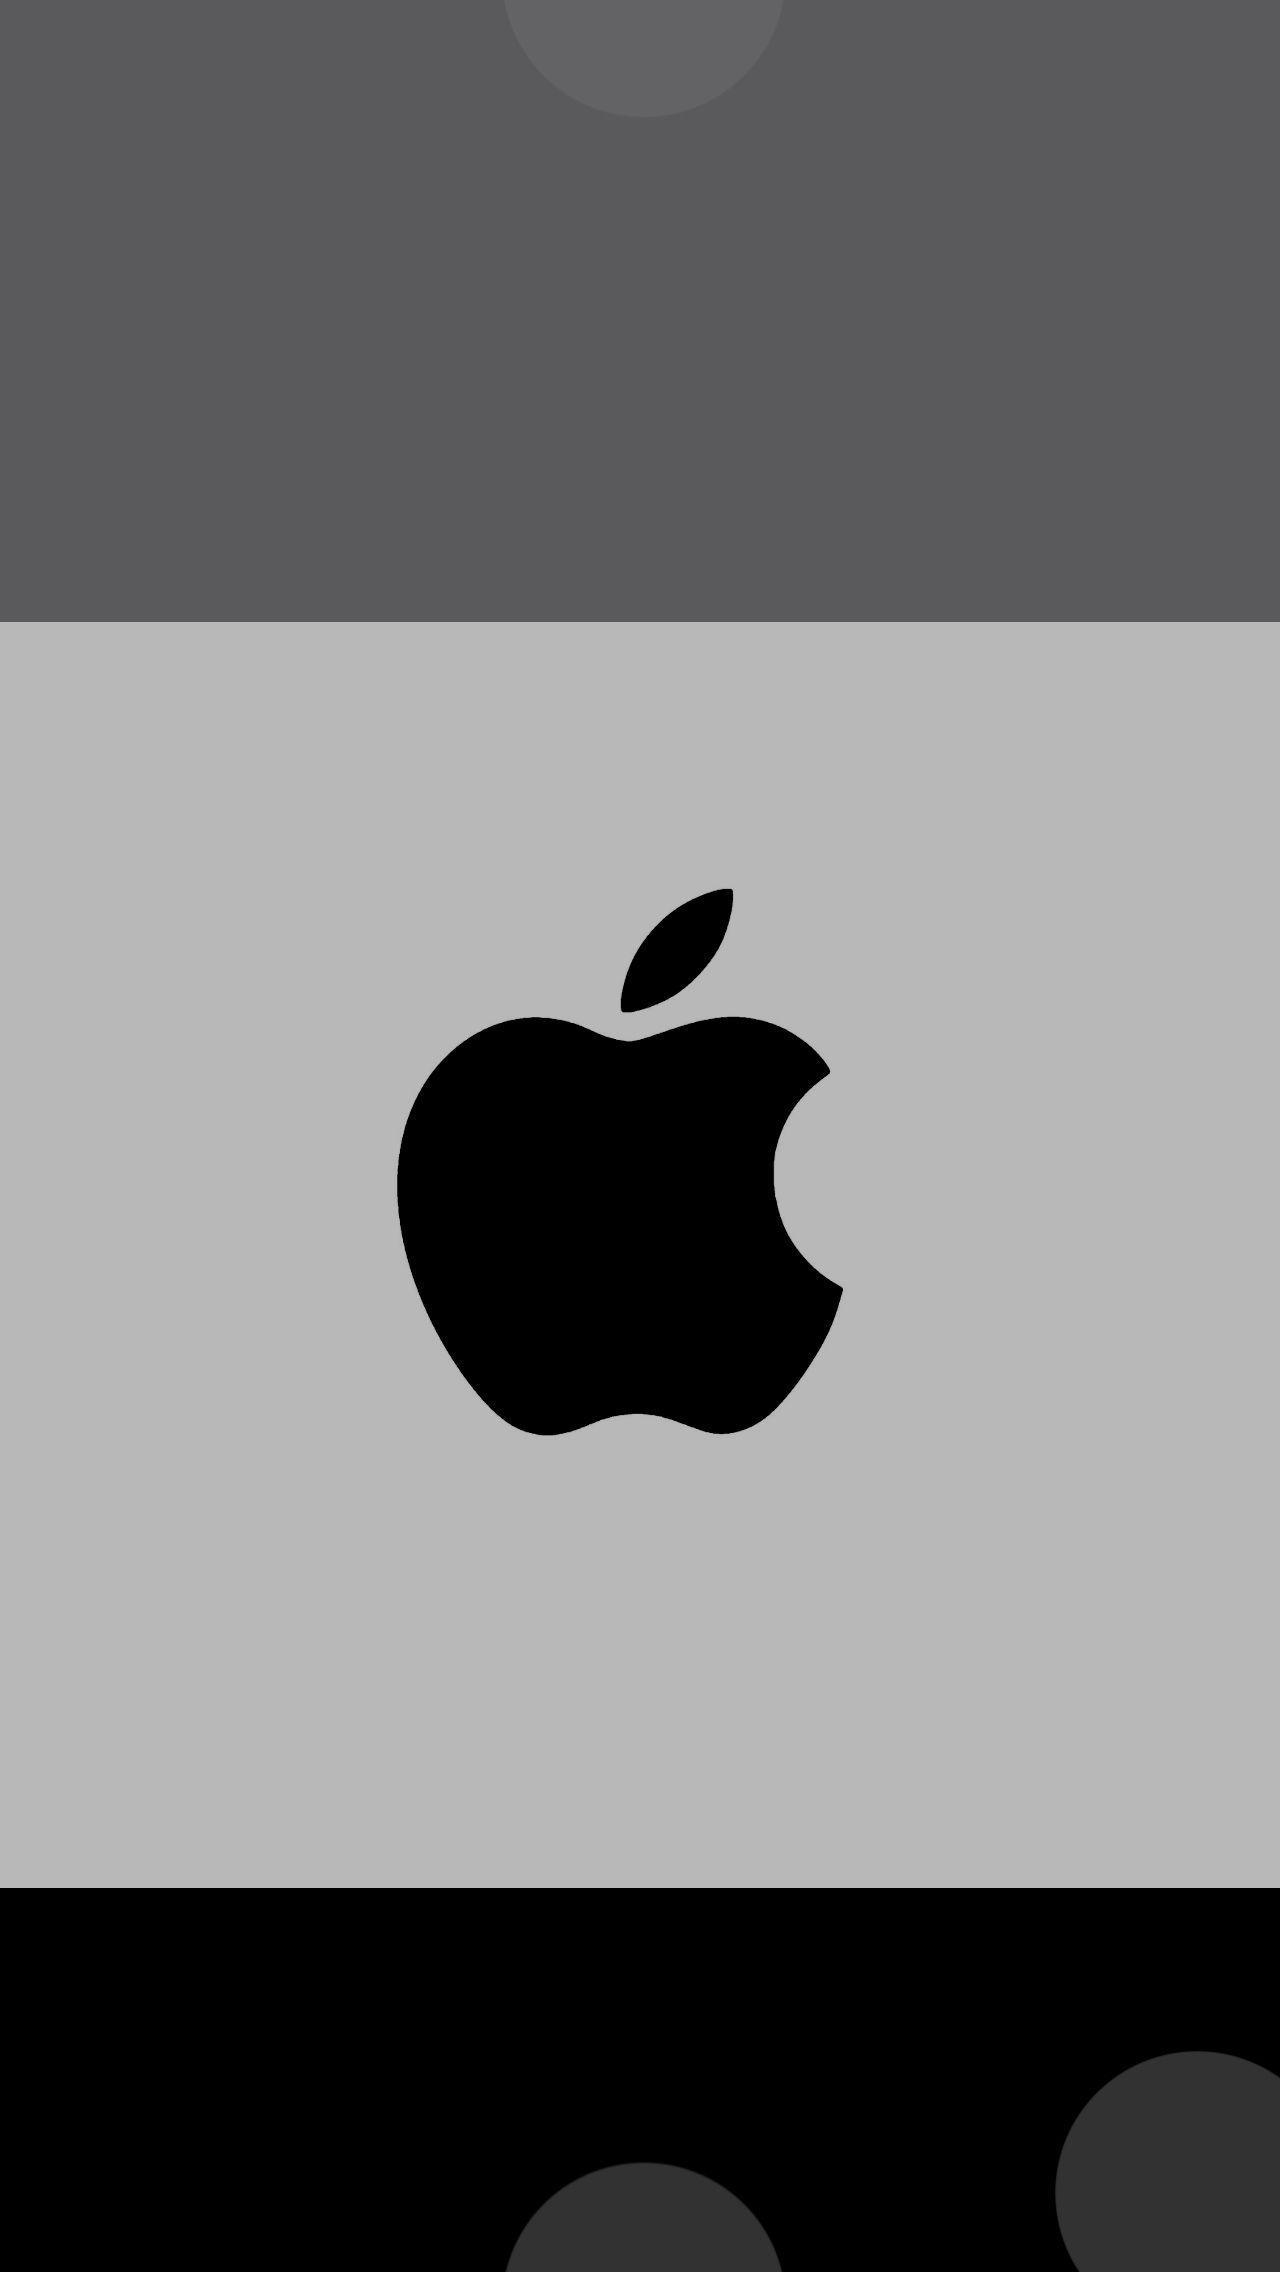 Iphone 5s Lock Screen Wallpapers Top Free Iphone 5s Lock